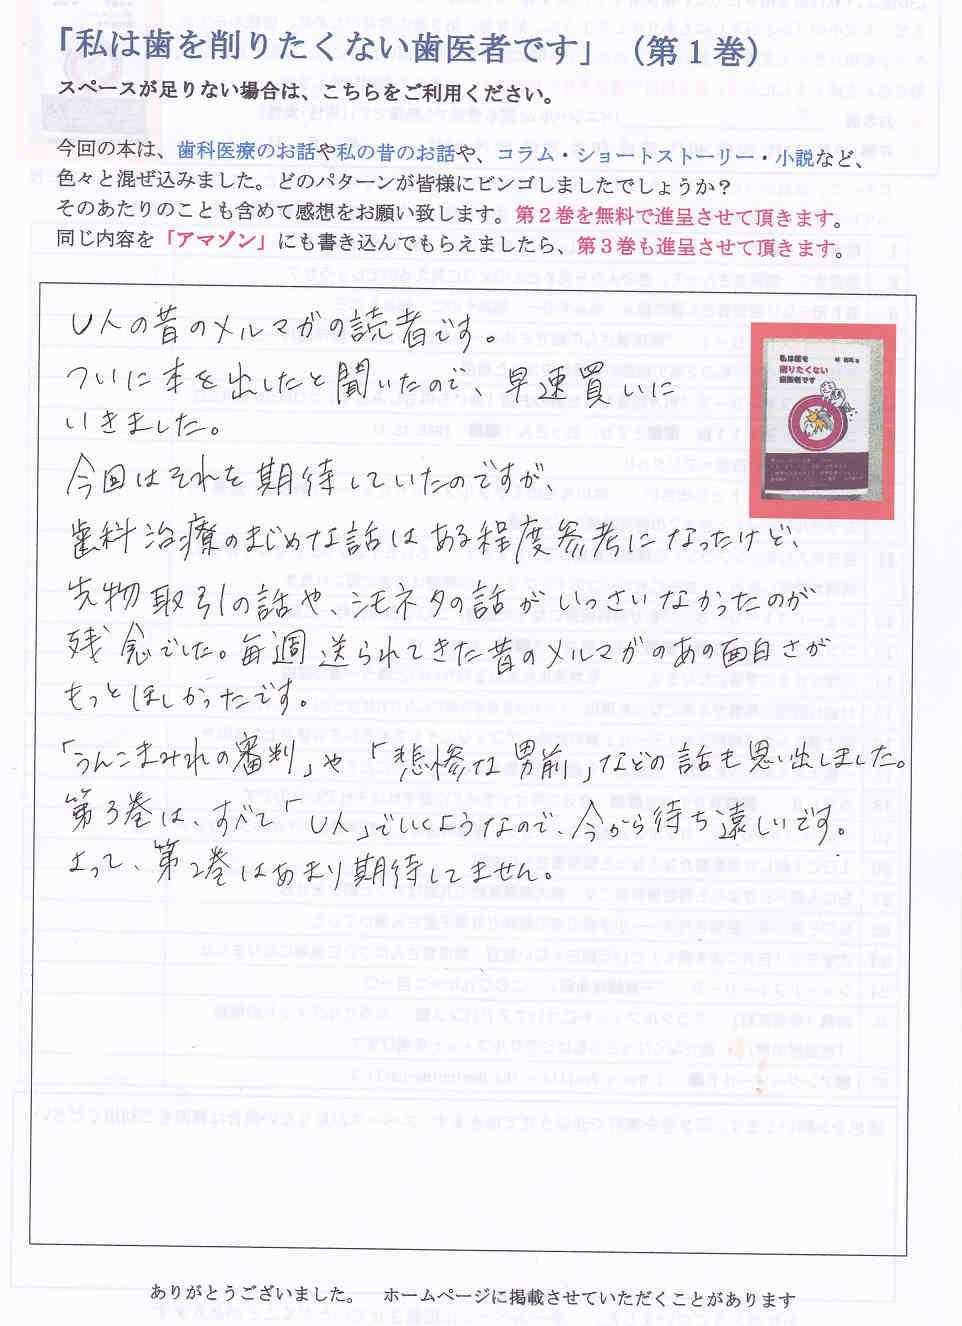 http://www.hayashi-dental.info/kinositaura.jpg